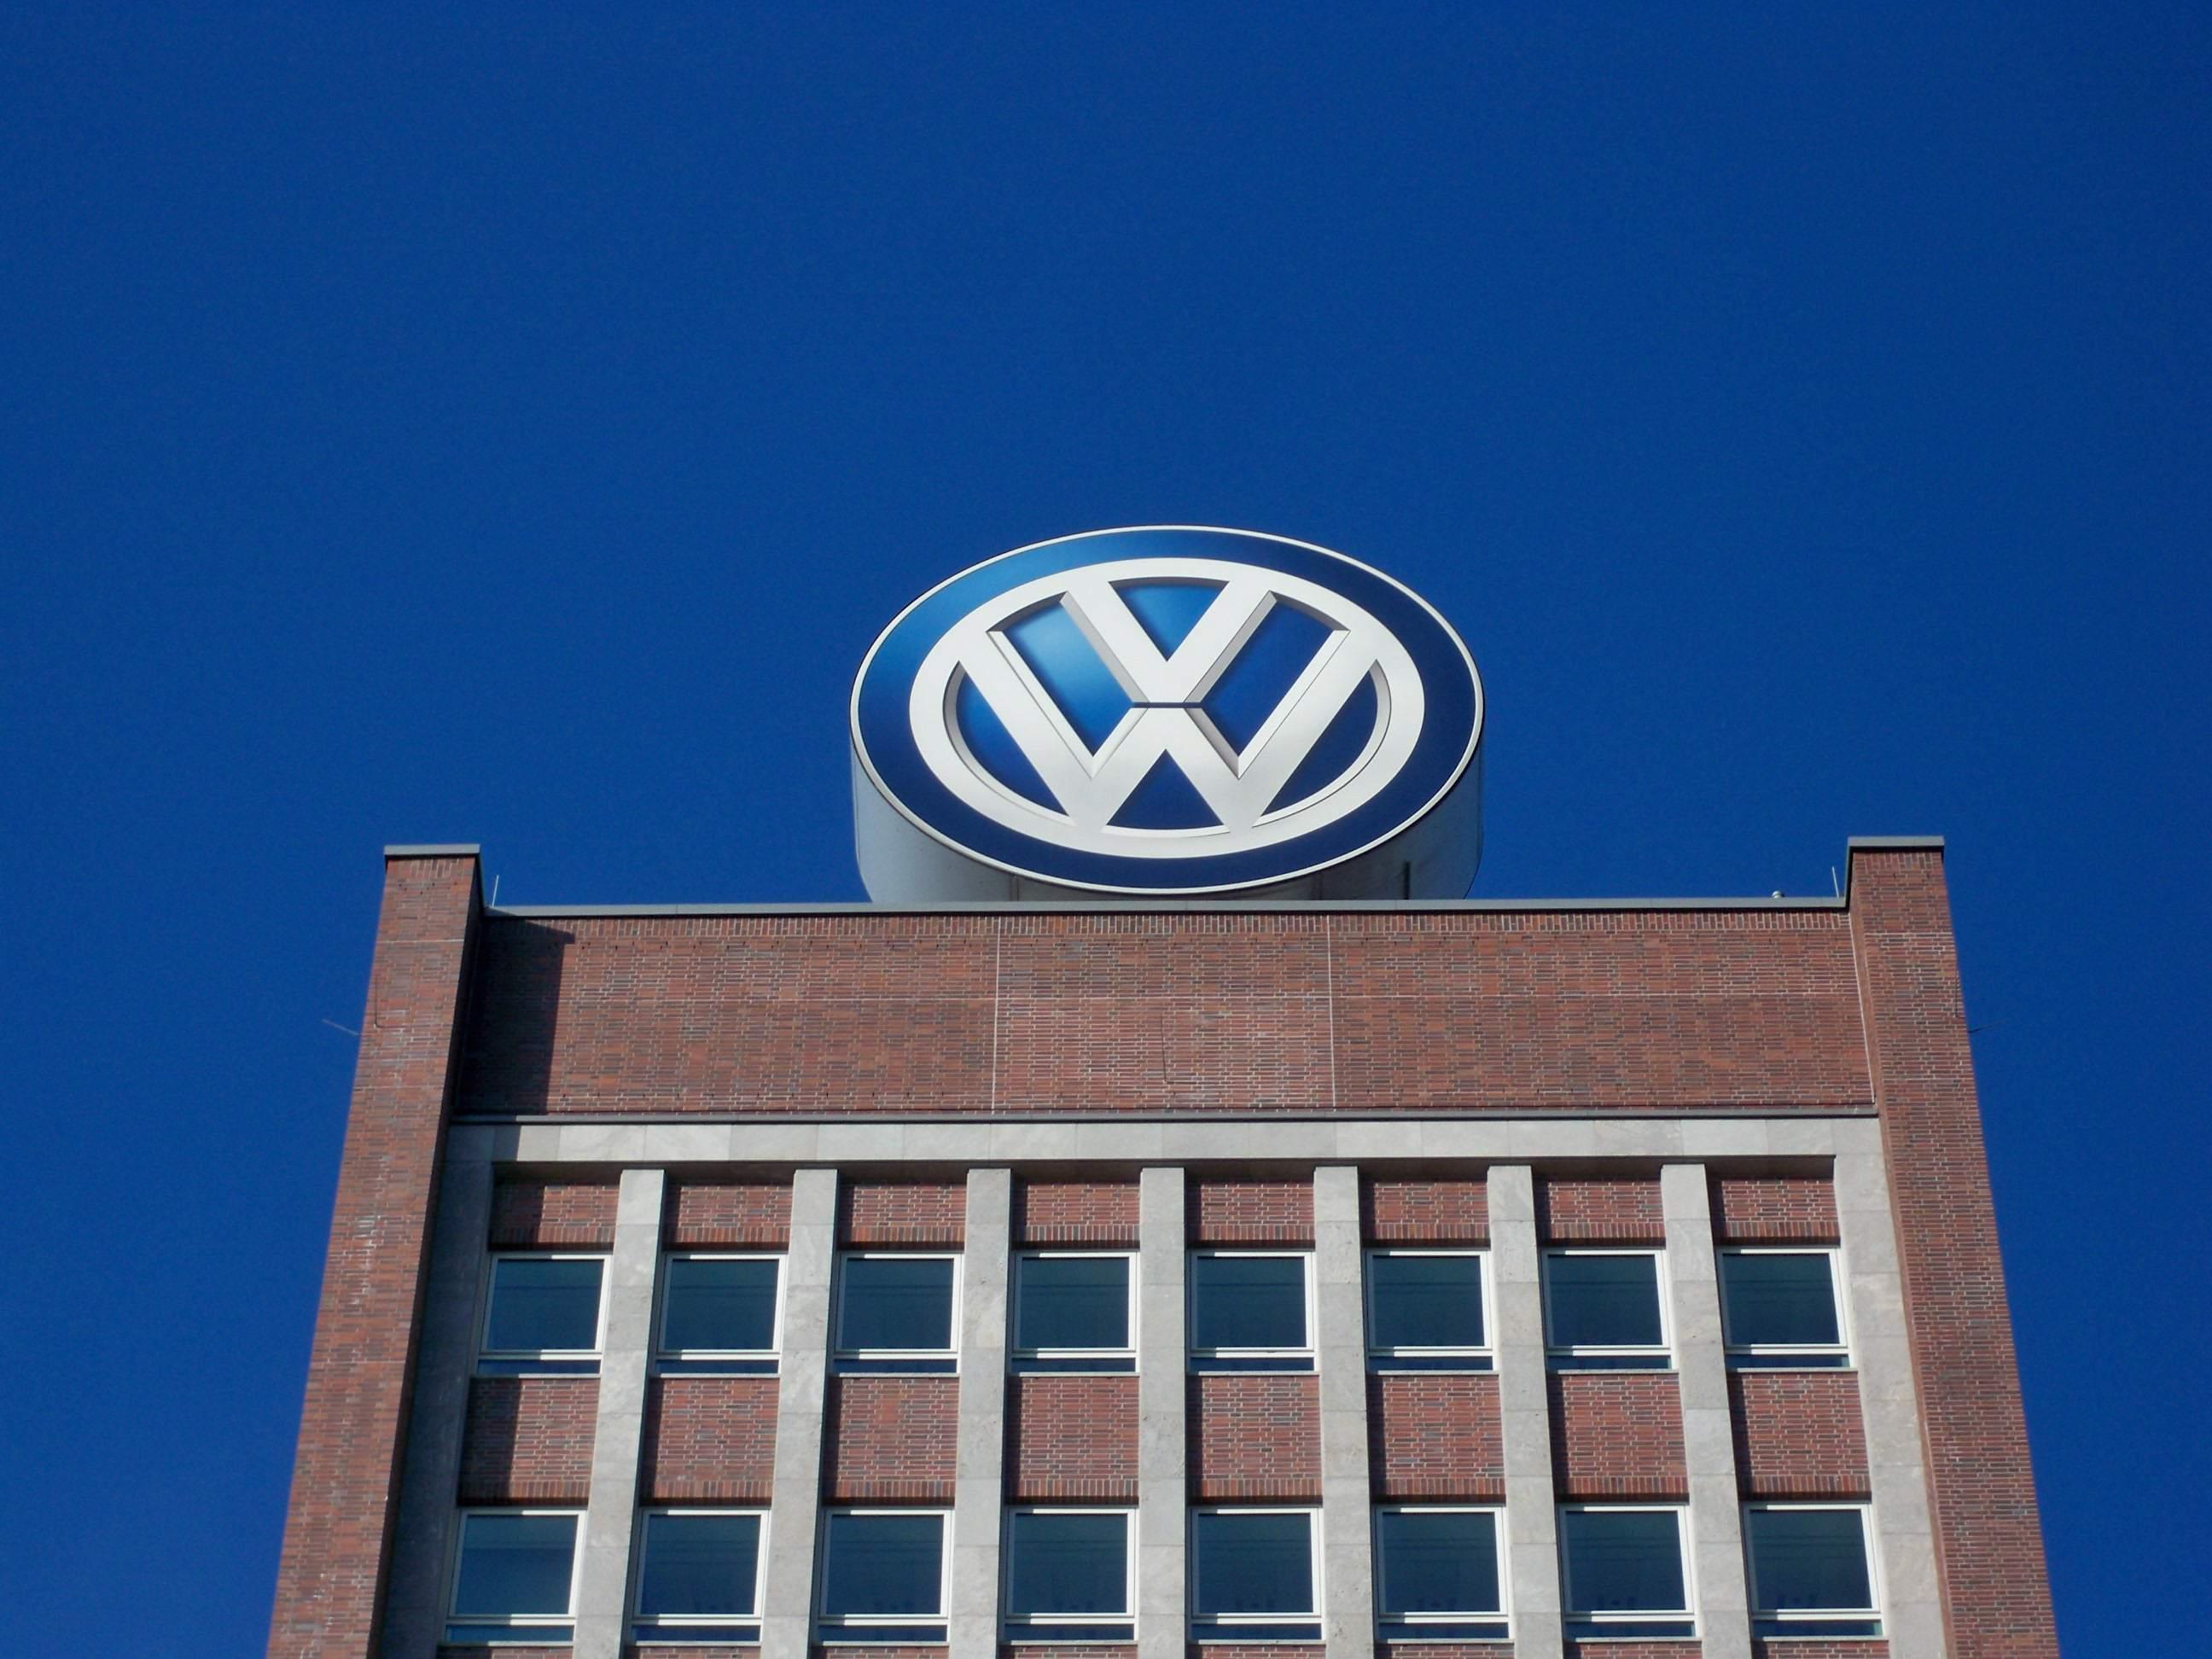 VW Hochhaus - Autoindustrie im Check